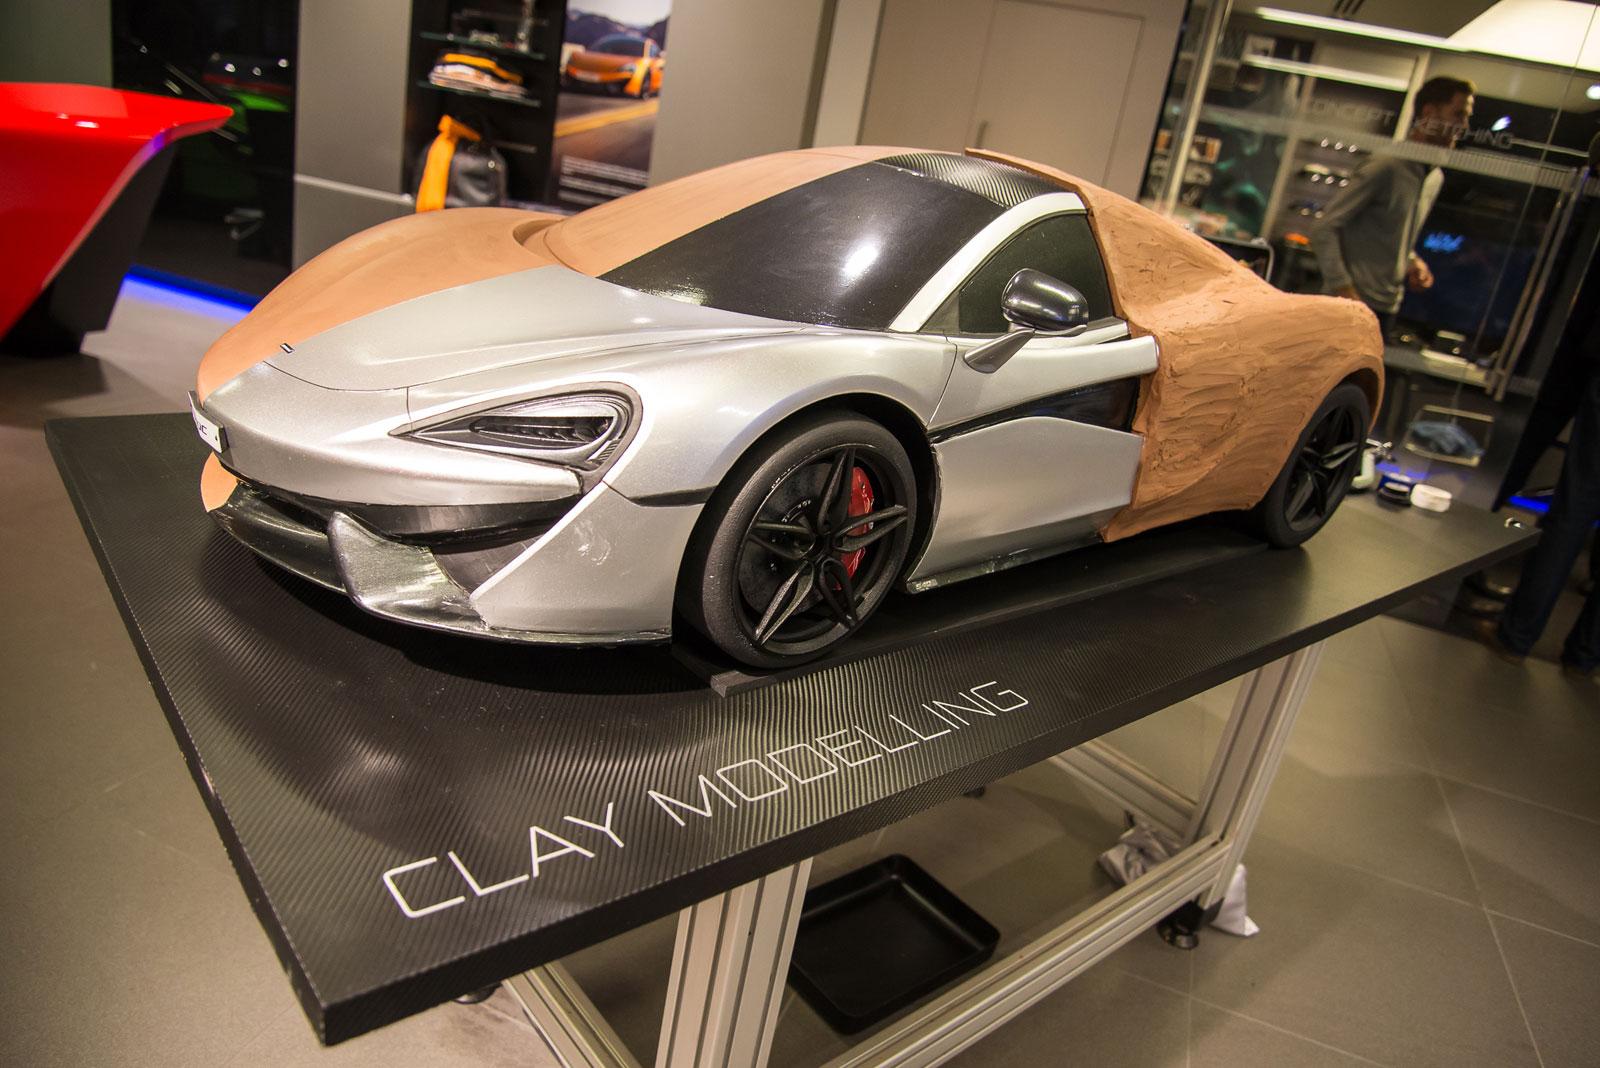 Mclaren Design Tour Event Scale Clay Model Car Body Design